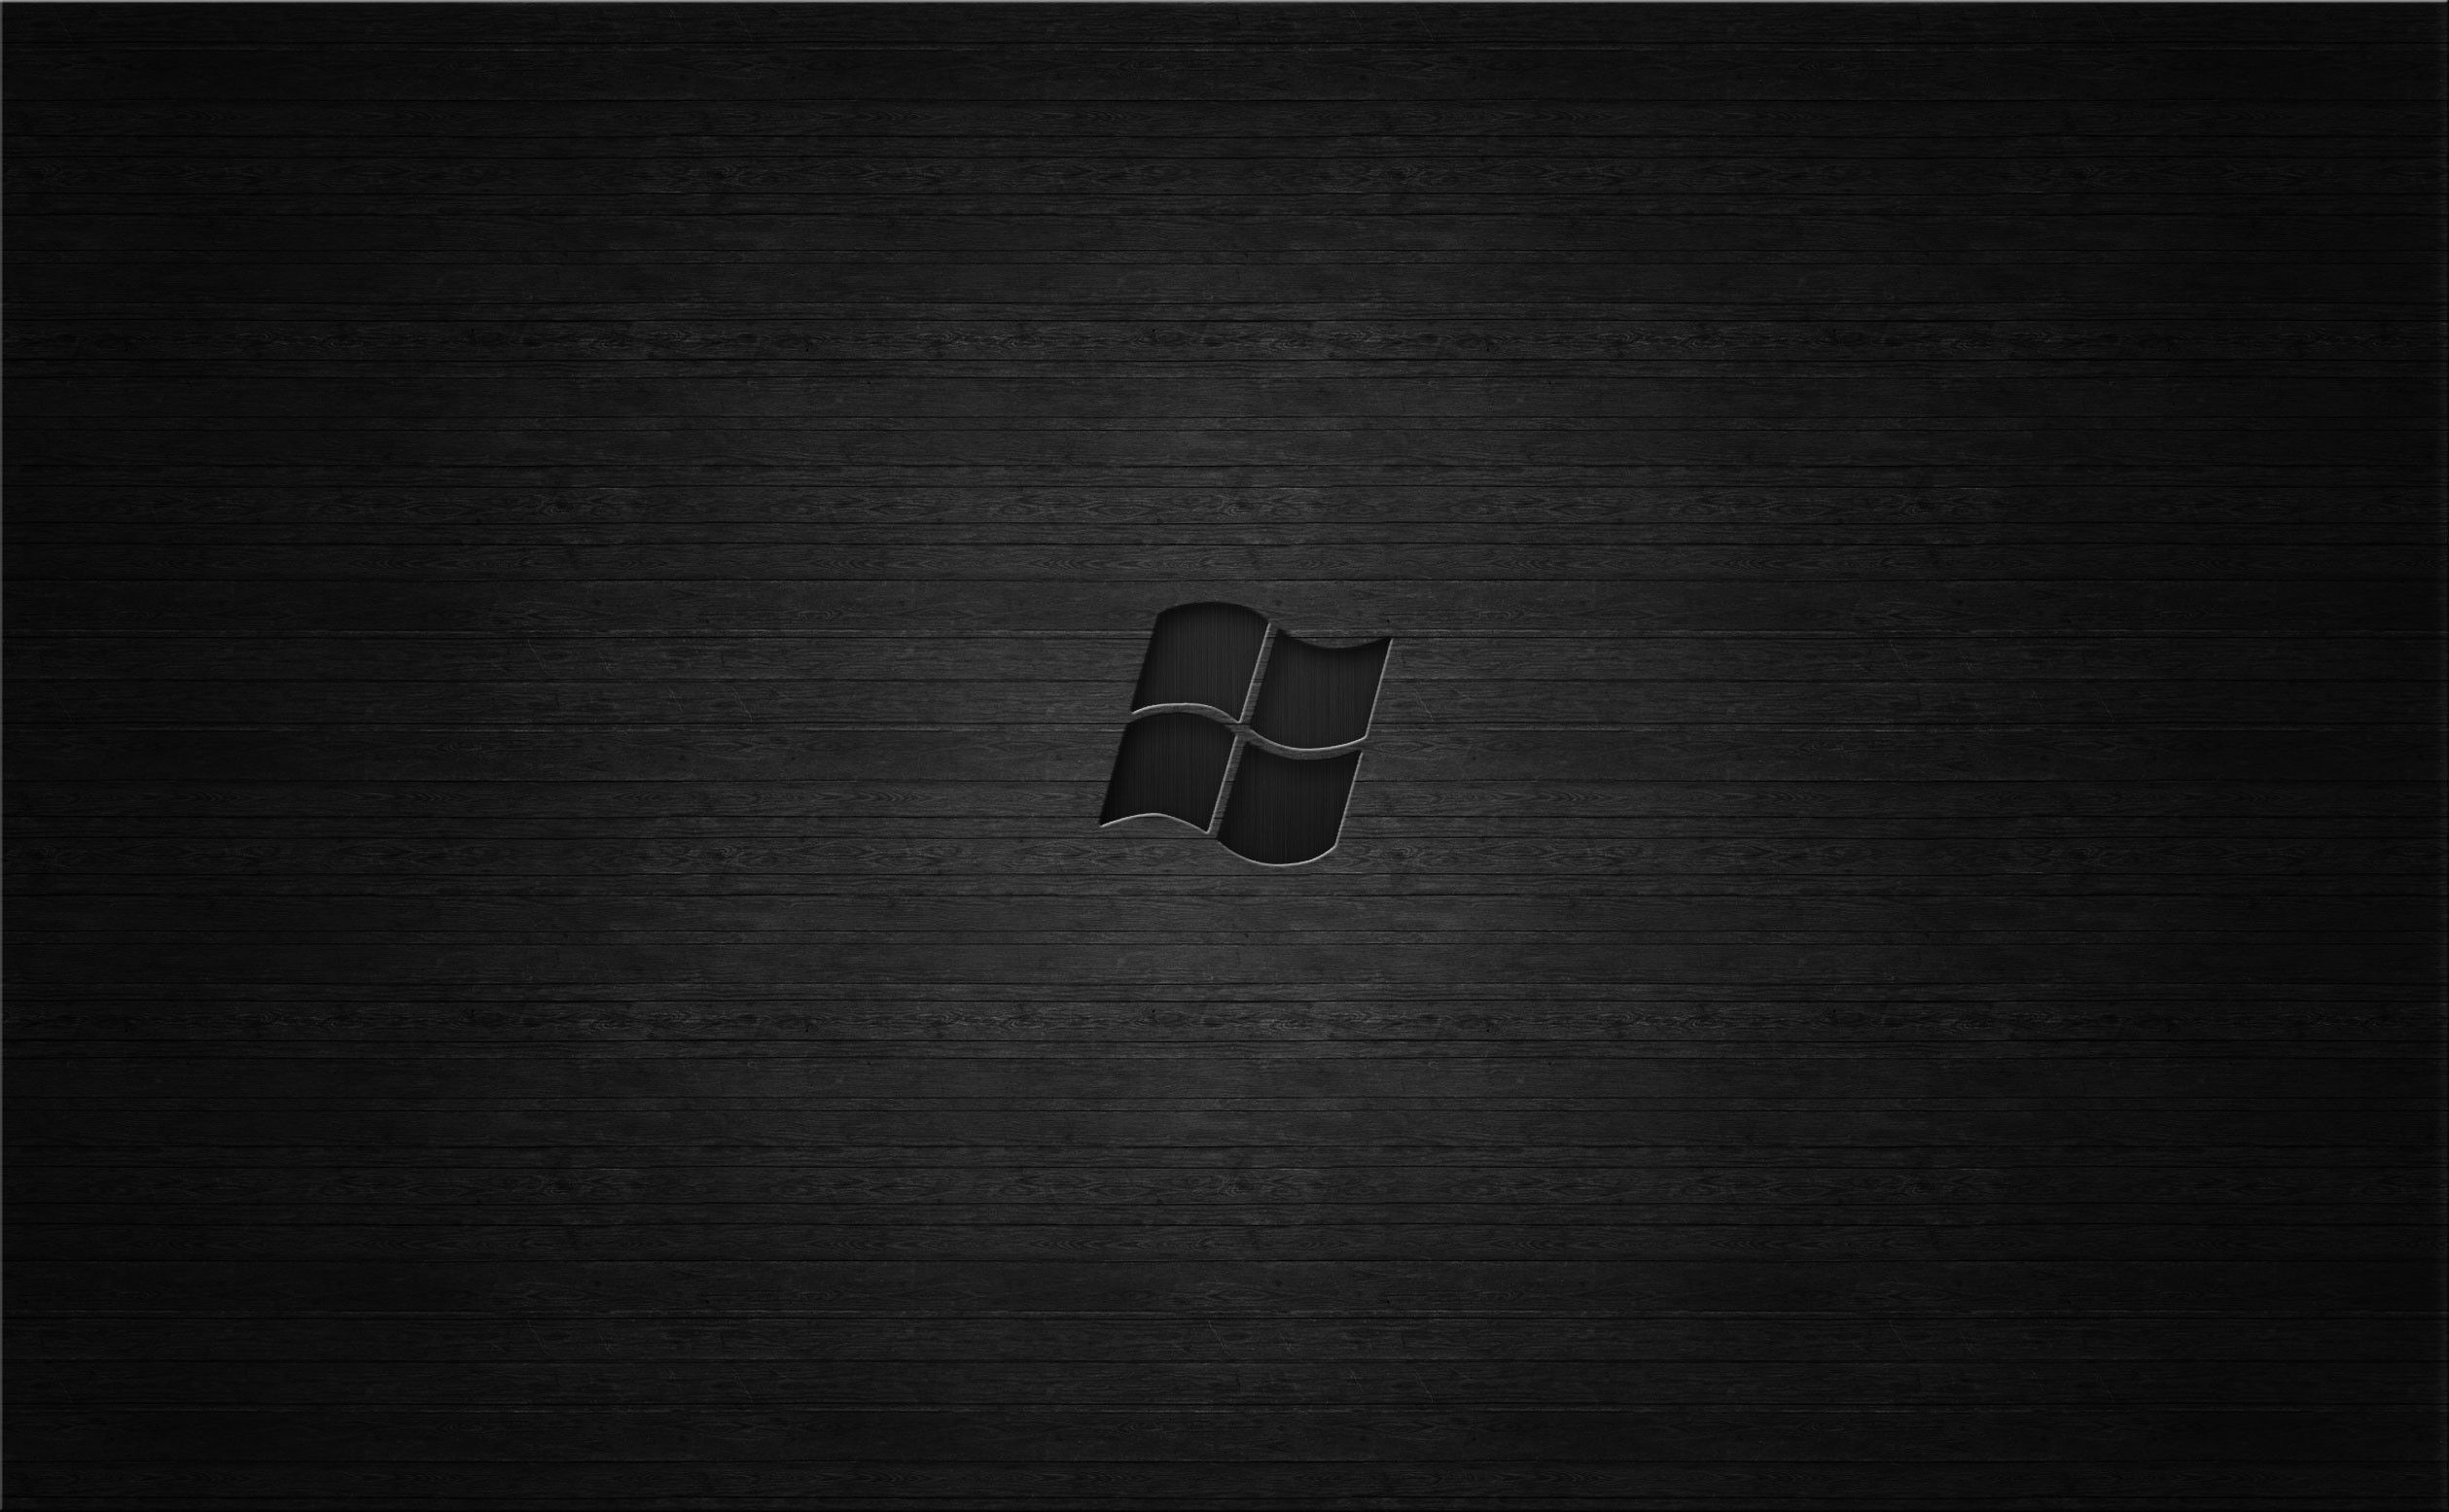 Windows 7 Black Wallpapers Top Free Windows 7 Black Backgrounds Wallpaperaccess